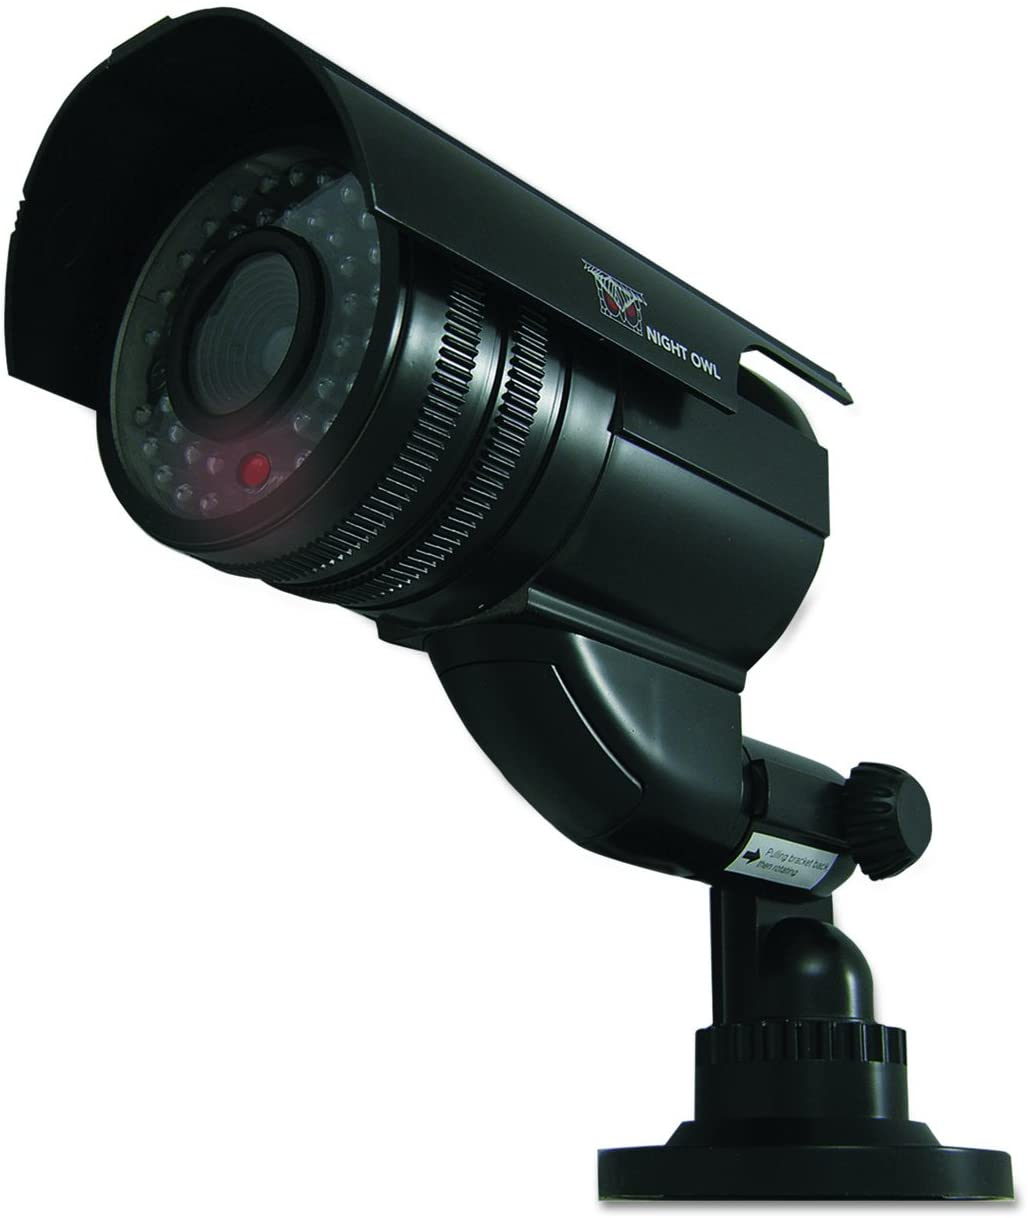 Night Owl Security DUM-Bullet-B Decoy Bullet Camera with Flashing LED Light,Black